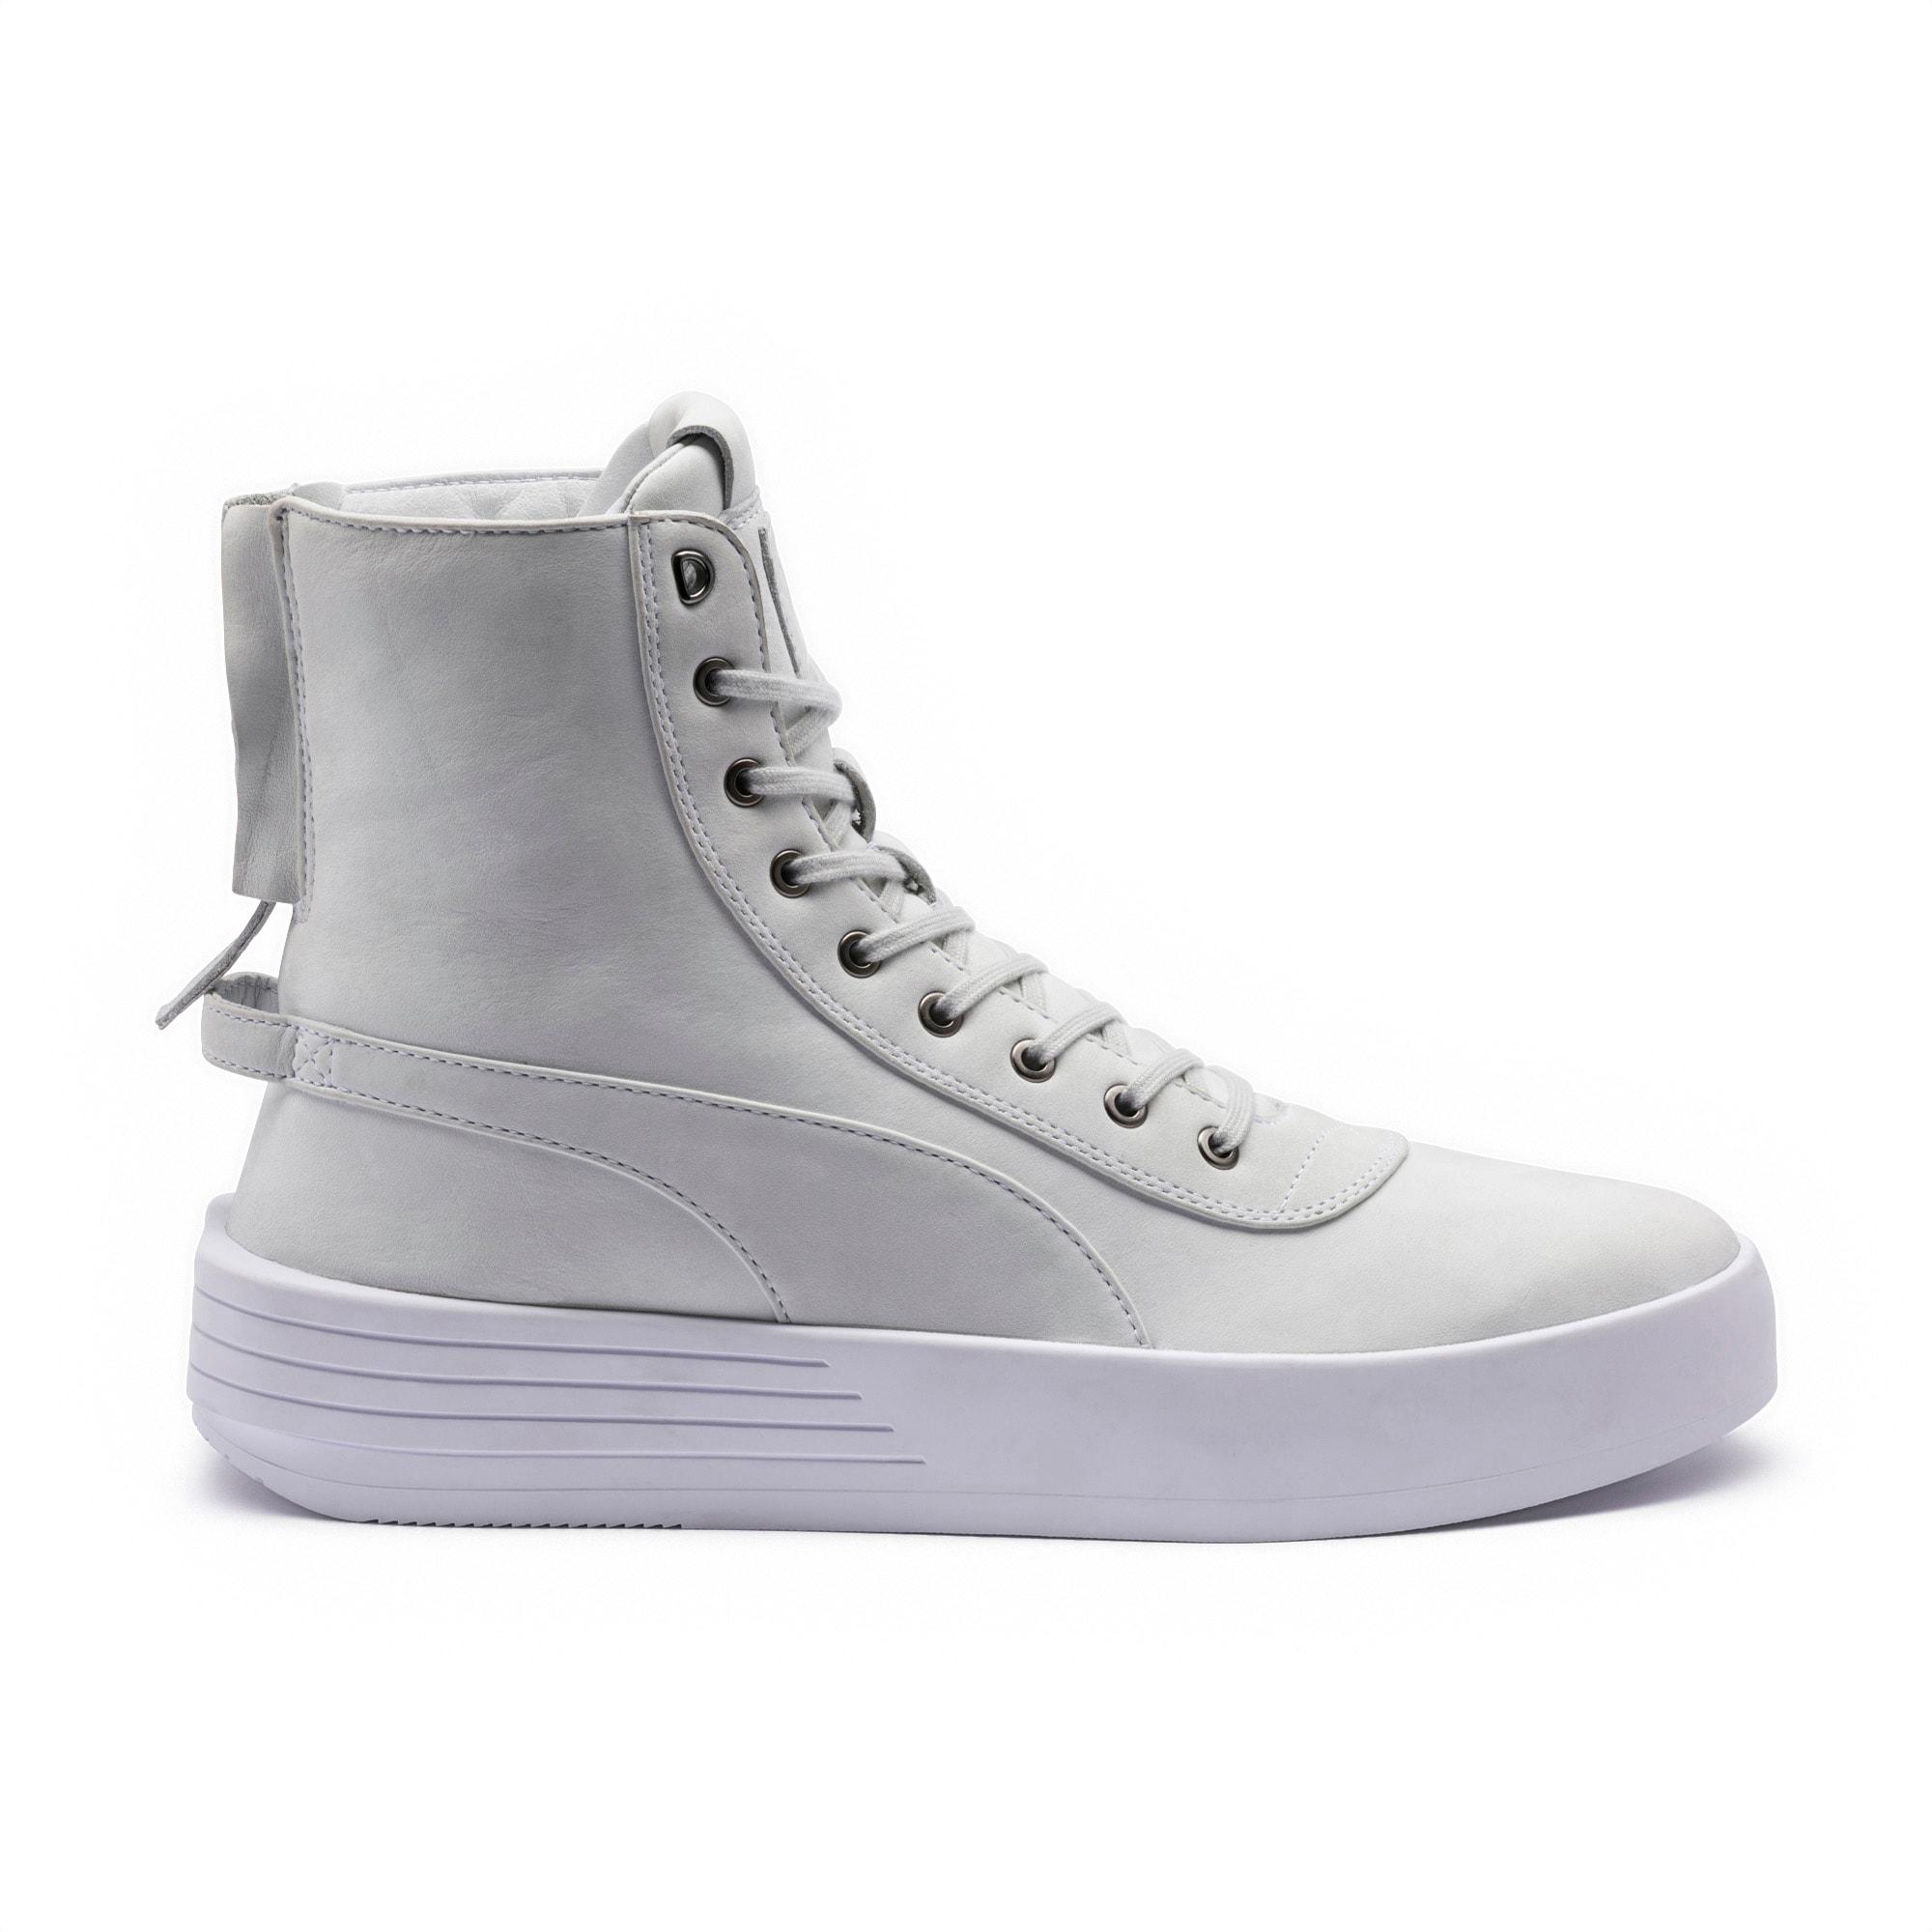 PUMA x XO Parallel | PUMA Sneakers | PUMA